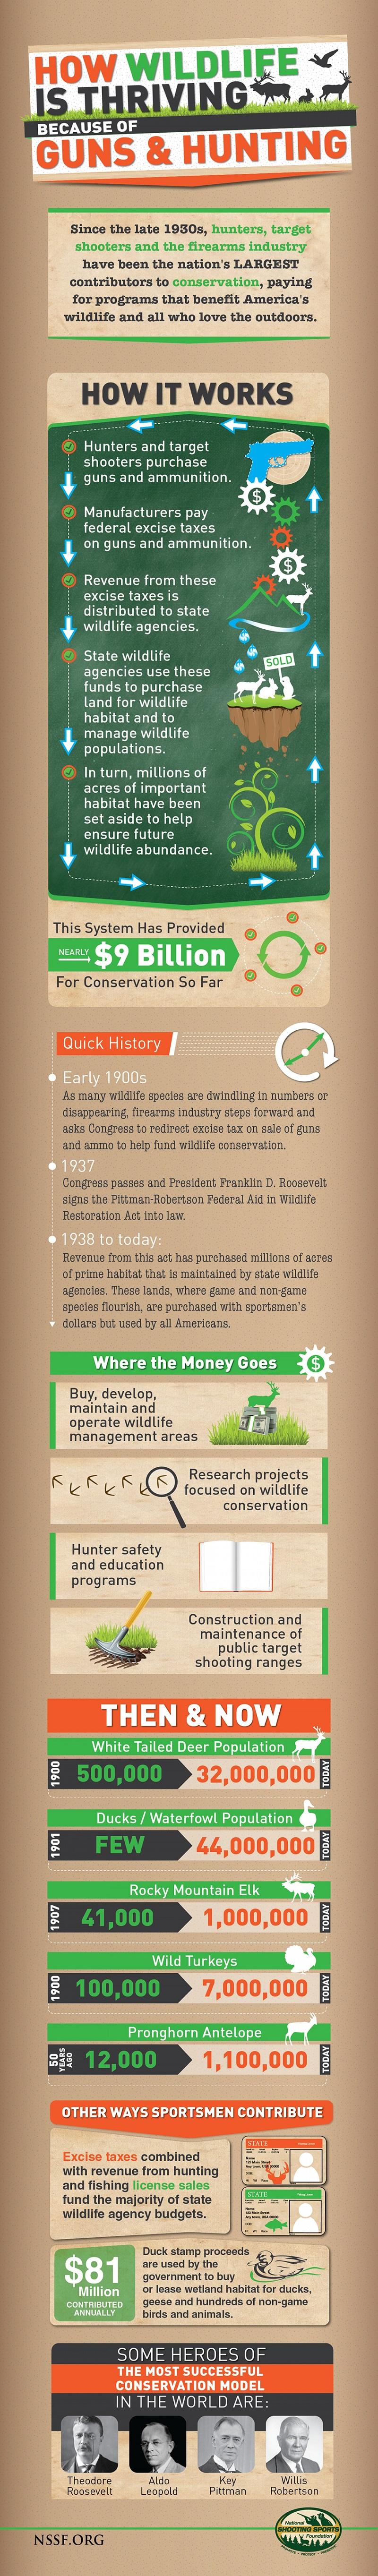 How WildlifeisThrivingBecauseofGuns Inforgraphic